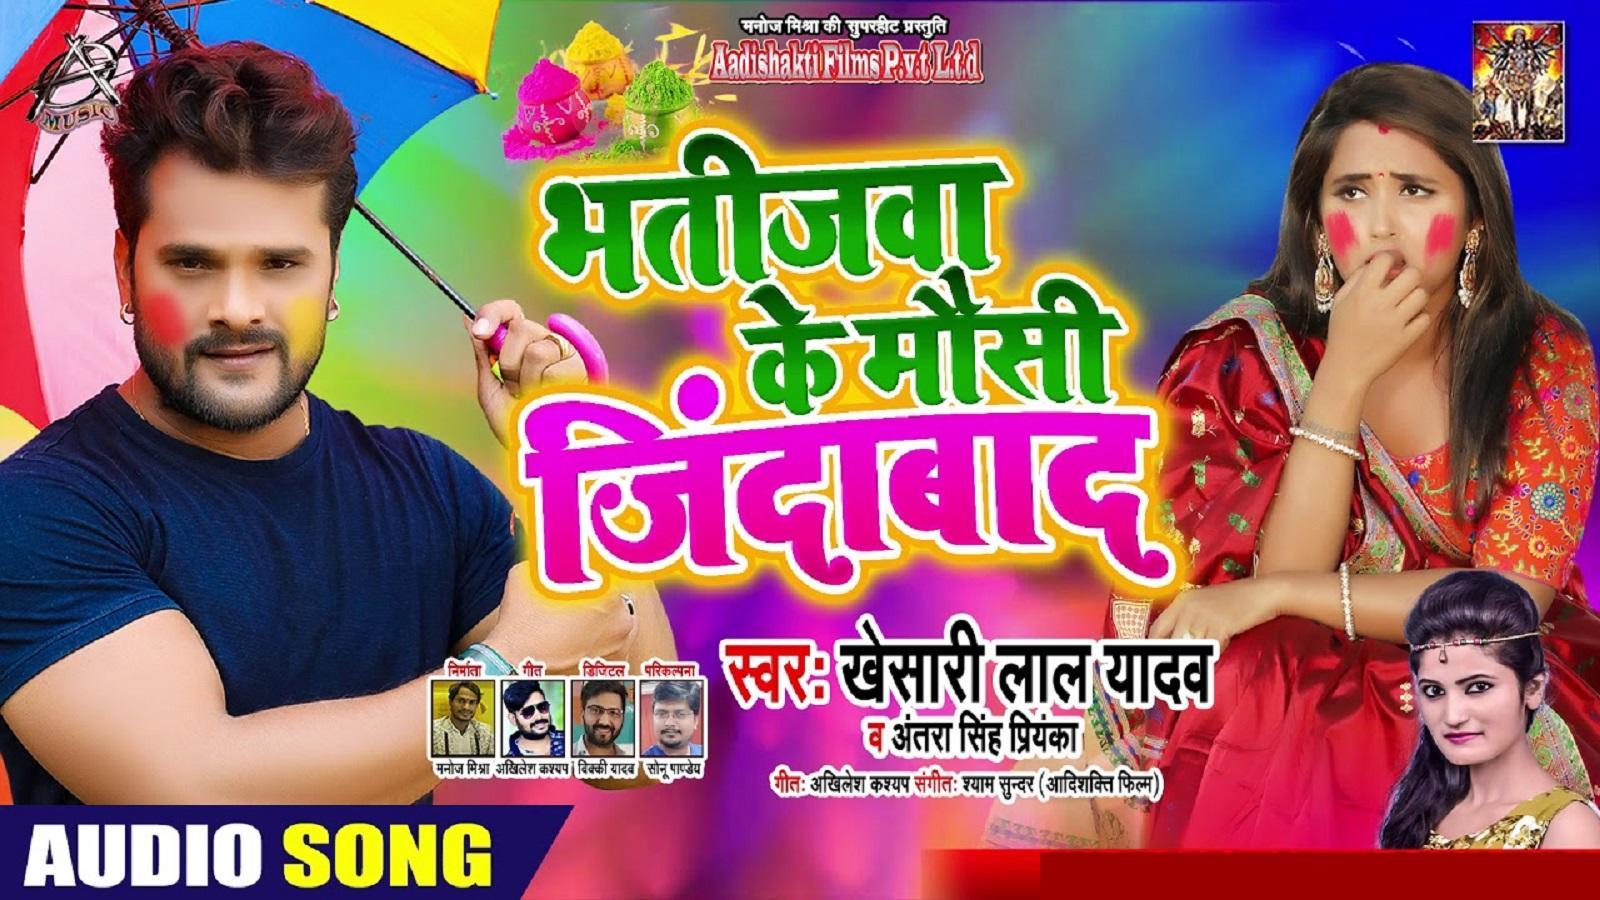 Khesari New Songs Bhojpuri Song 2020 Khesari Lal Yadav S Latest Bhojpuri Gana Bhatijwa Ke Mausi Jindabad